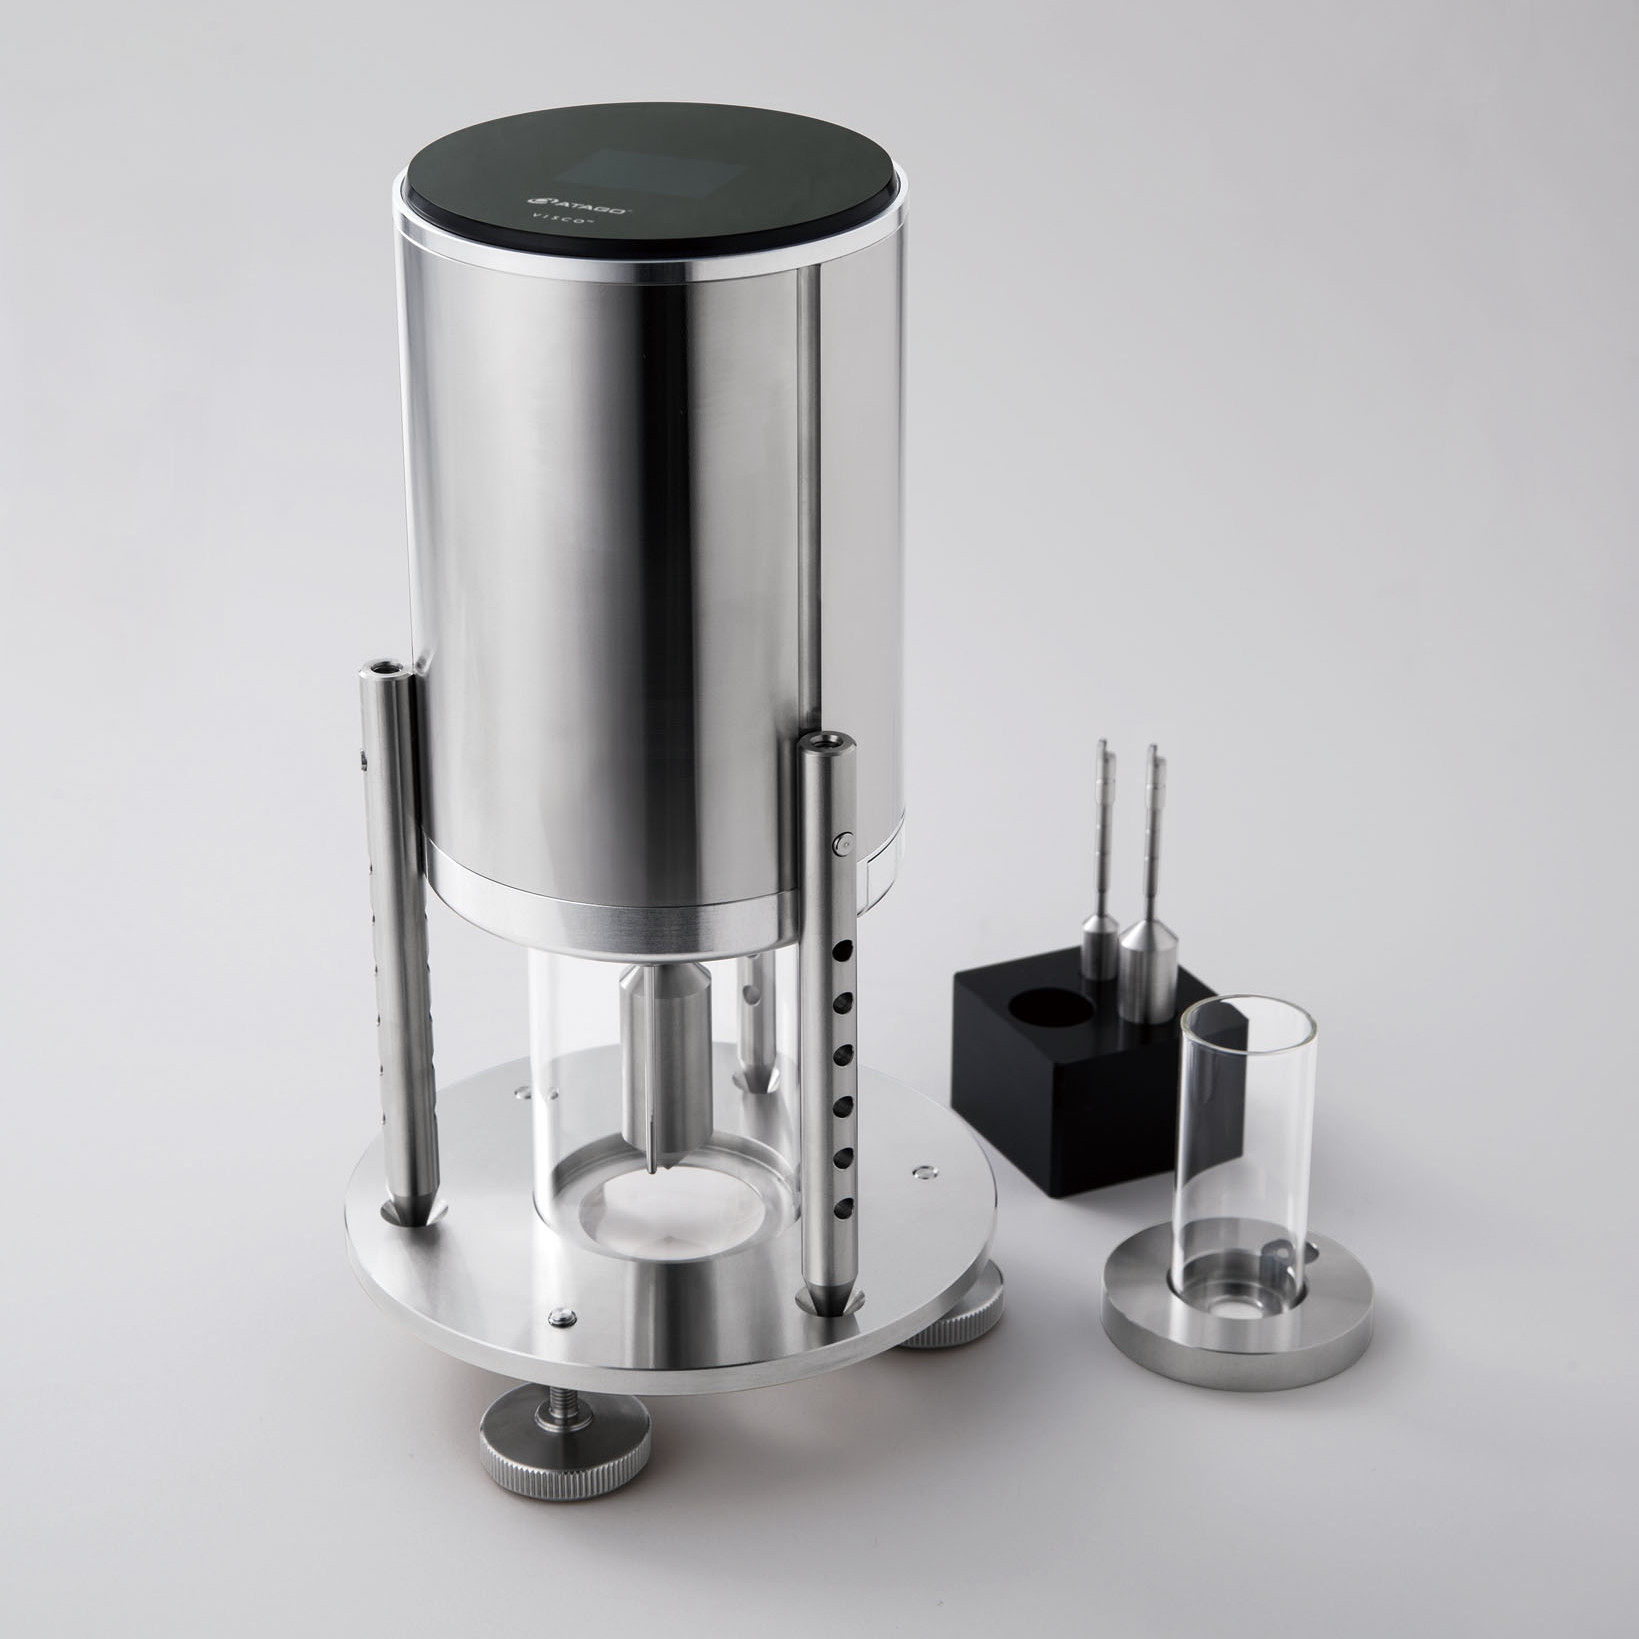 ATAGO Presents New Portable Viscometry Alternative